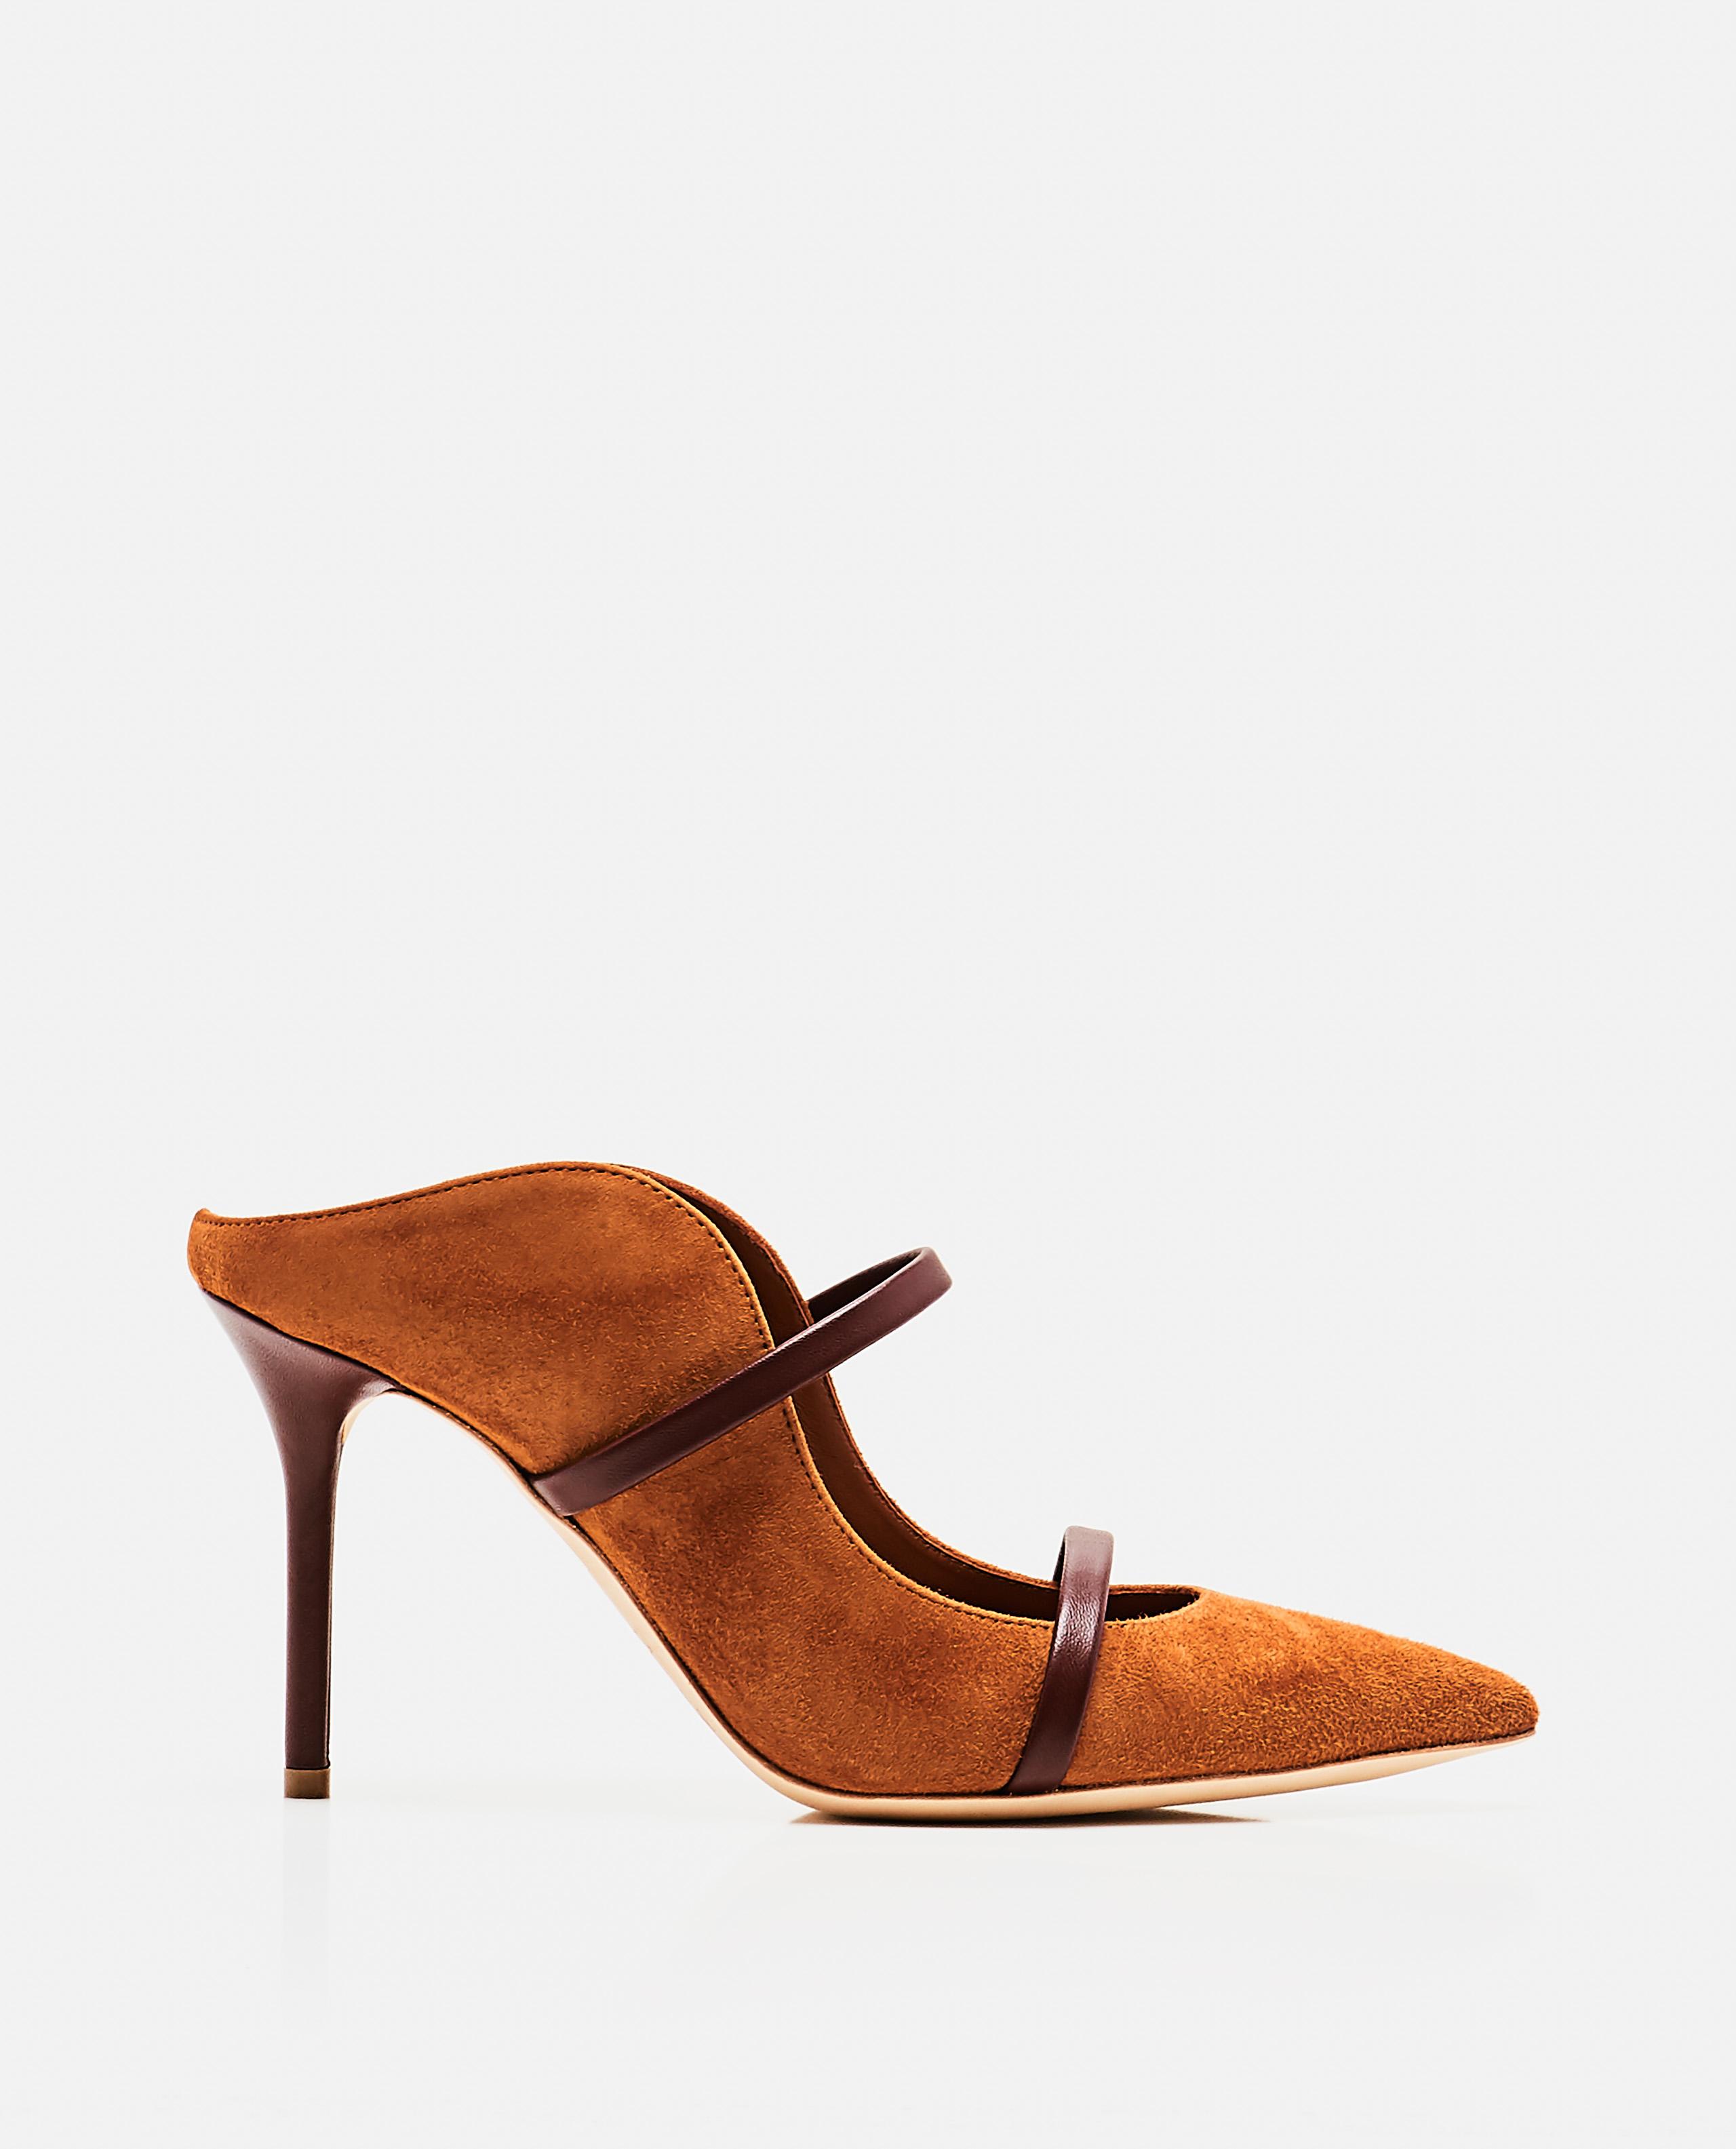 Maureen 85 leather mules